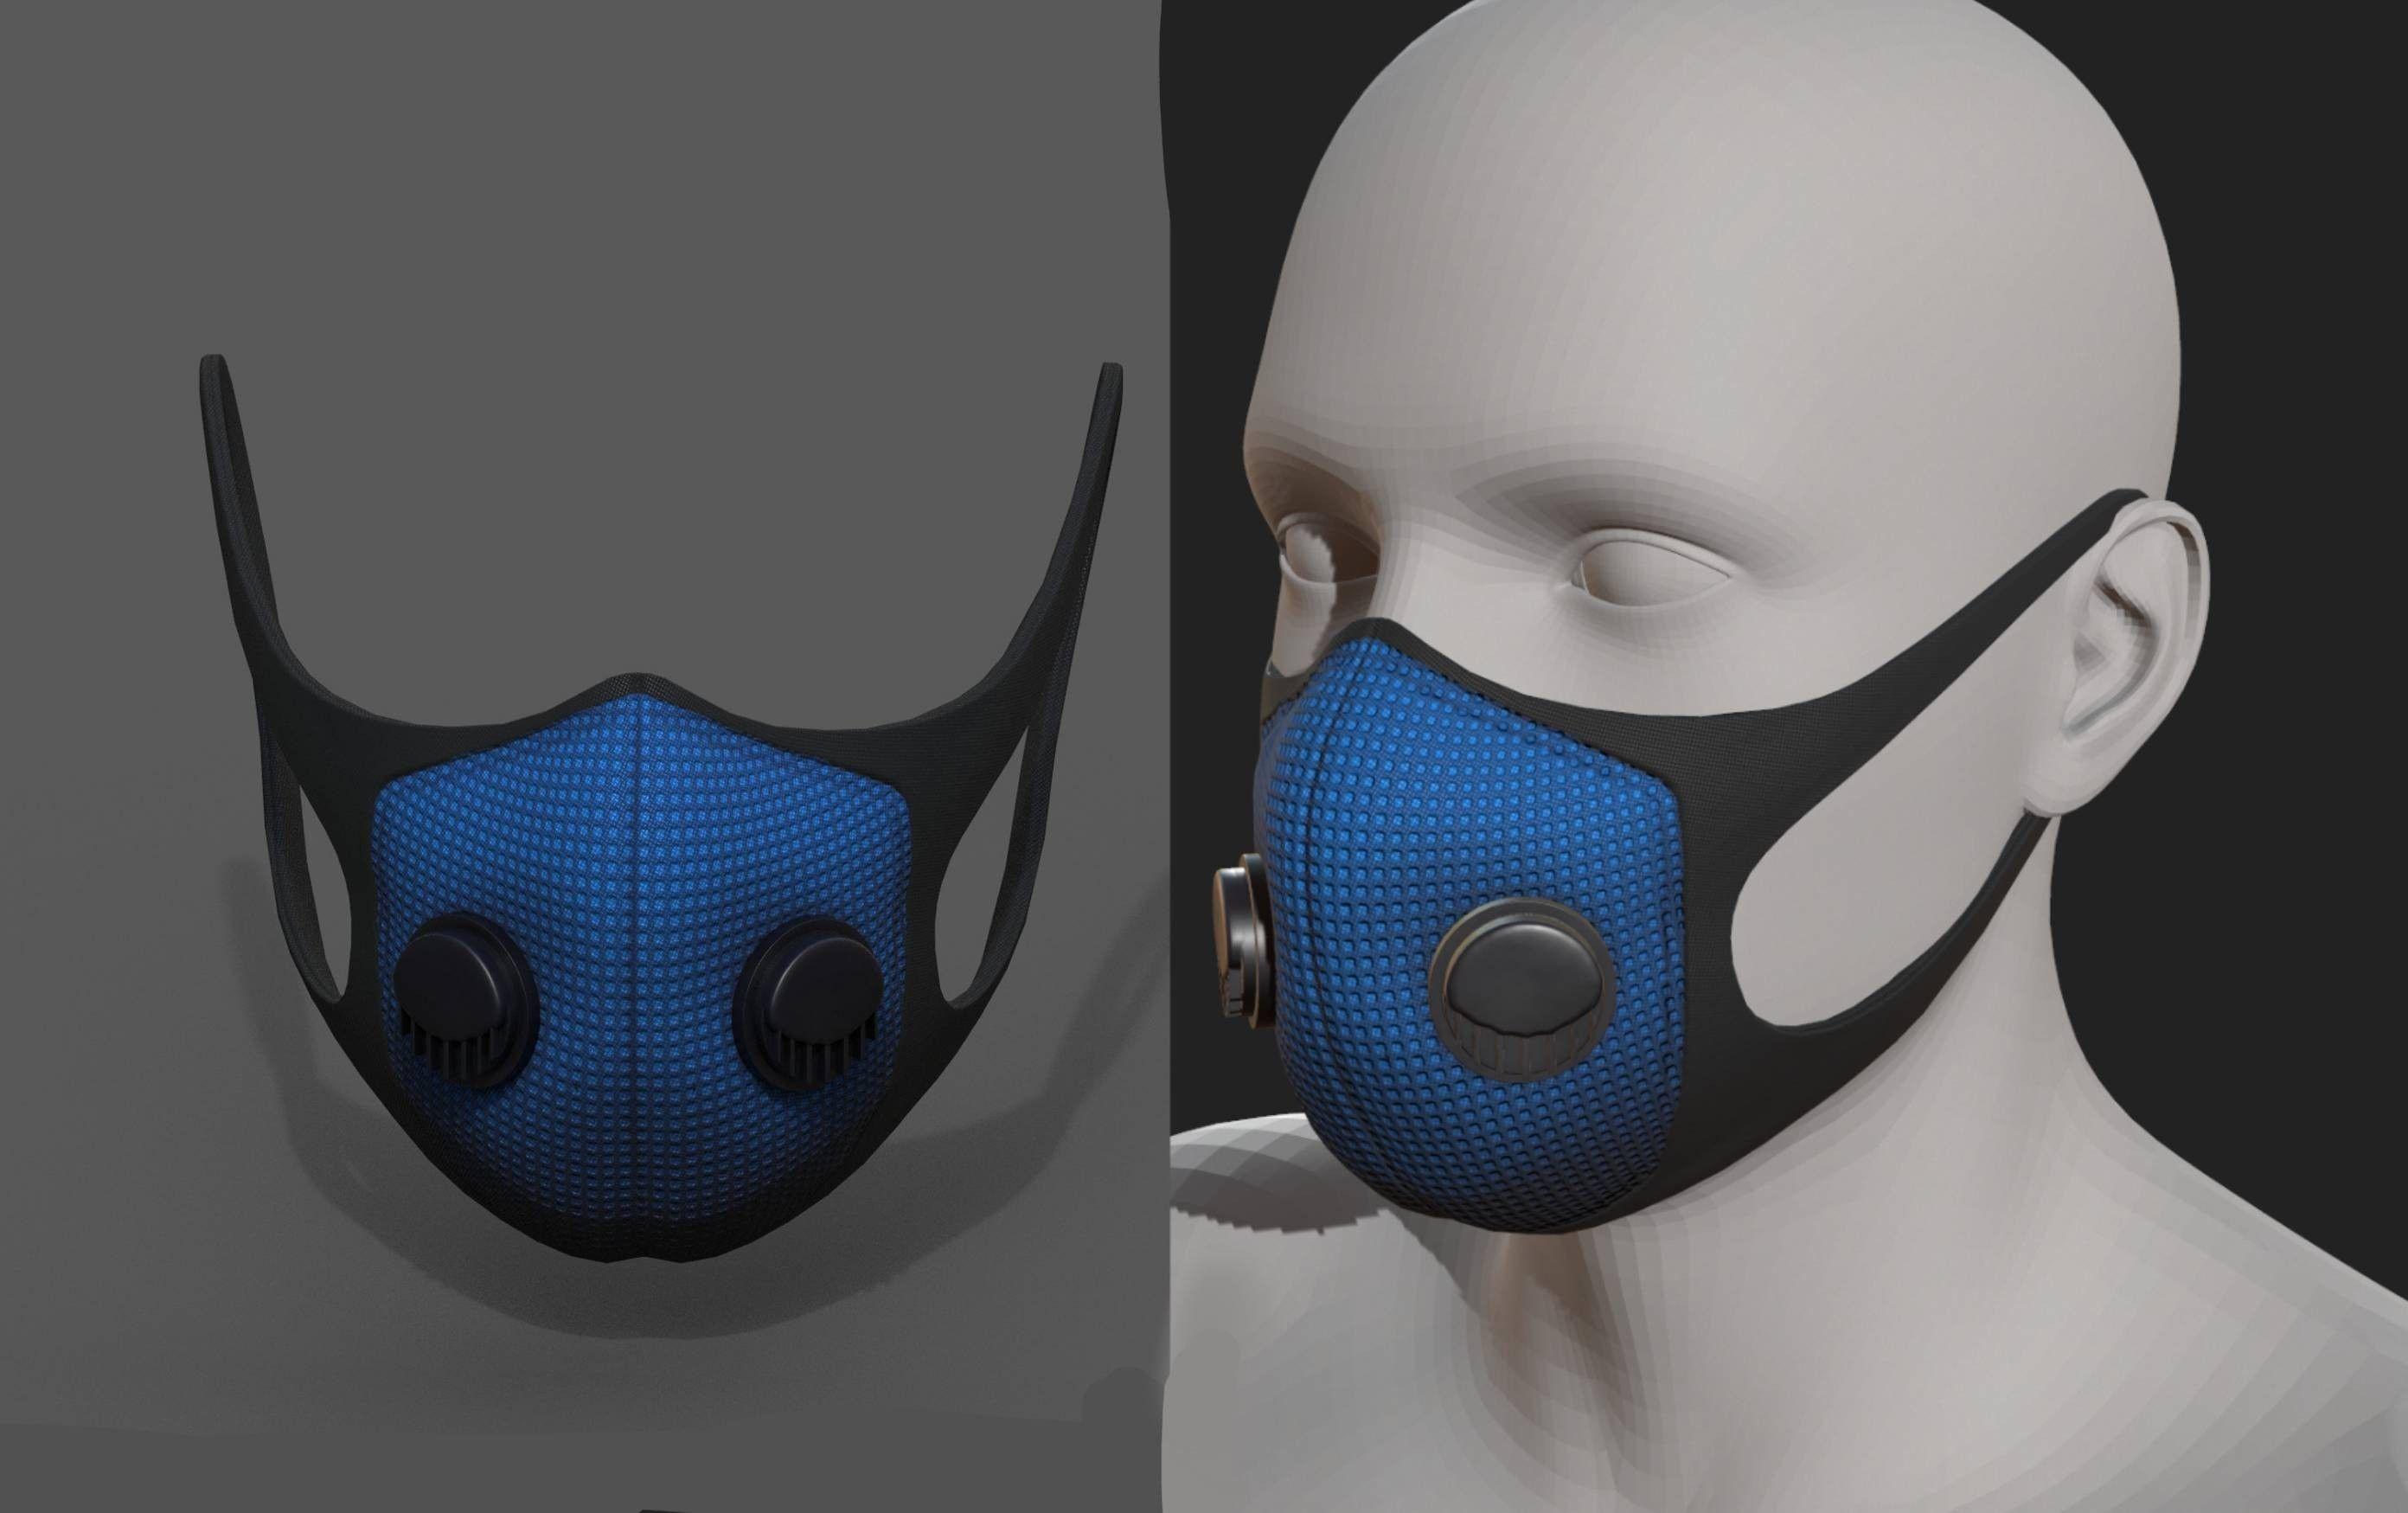 Gas mask protection futuristic fantasy  isolated